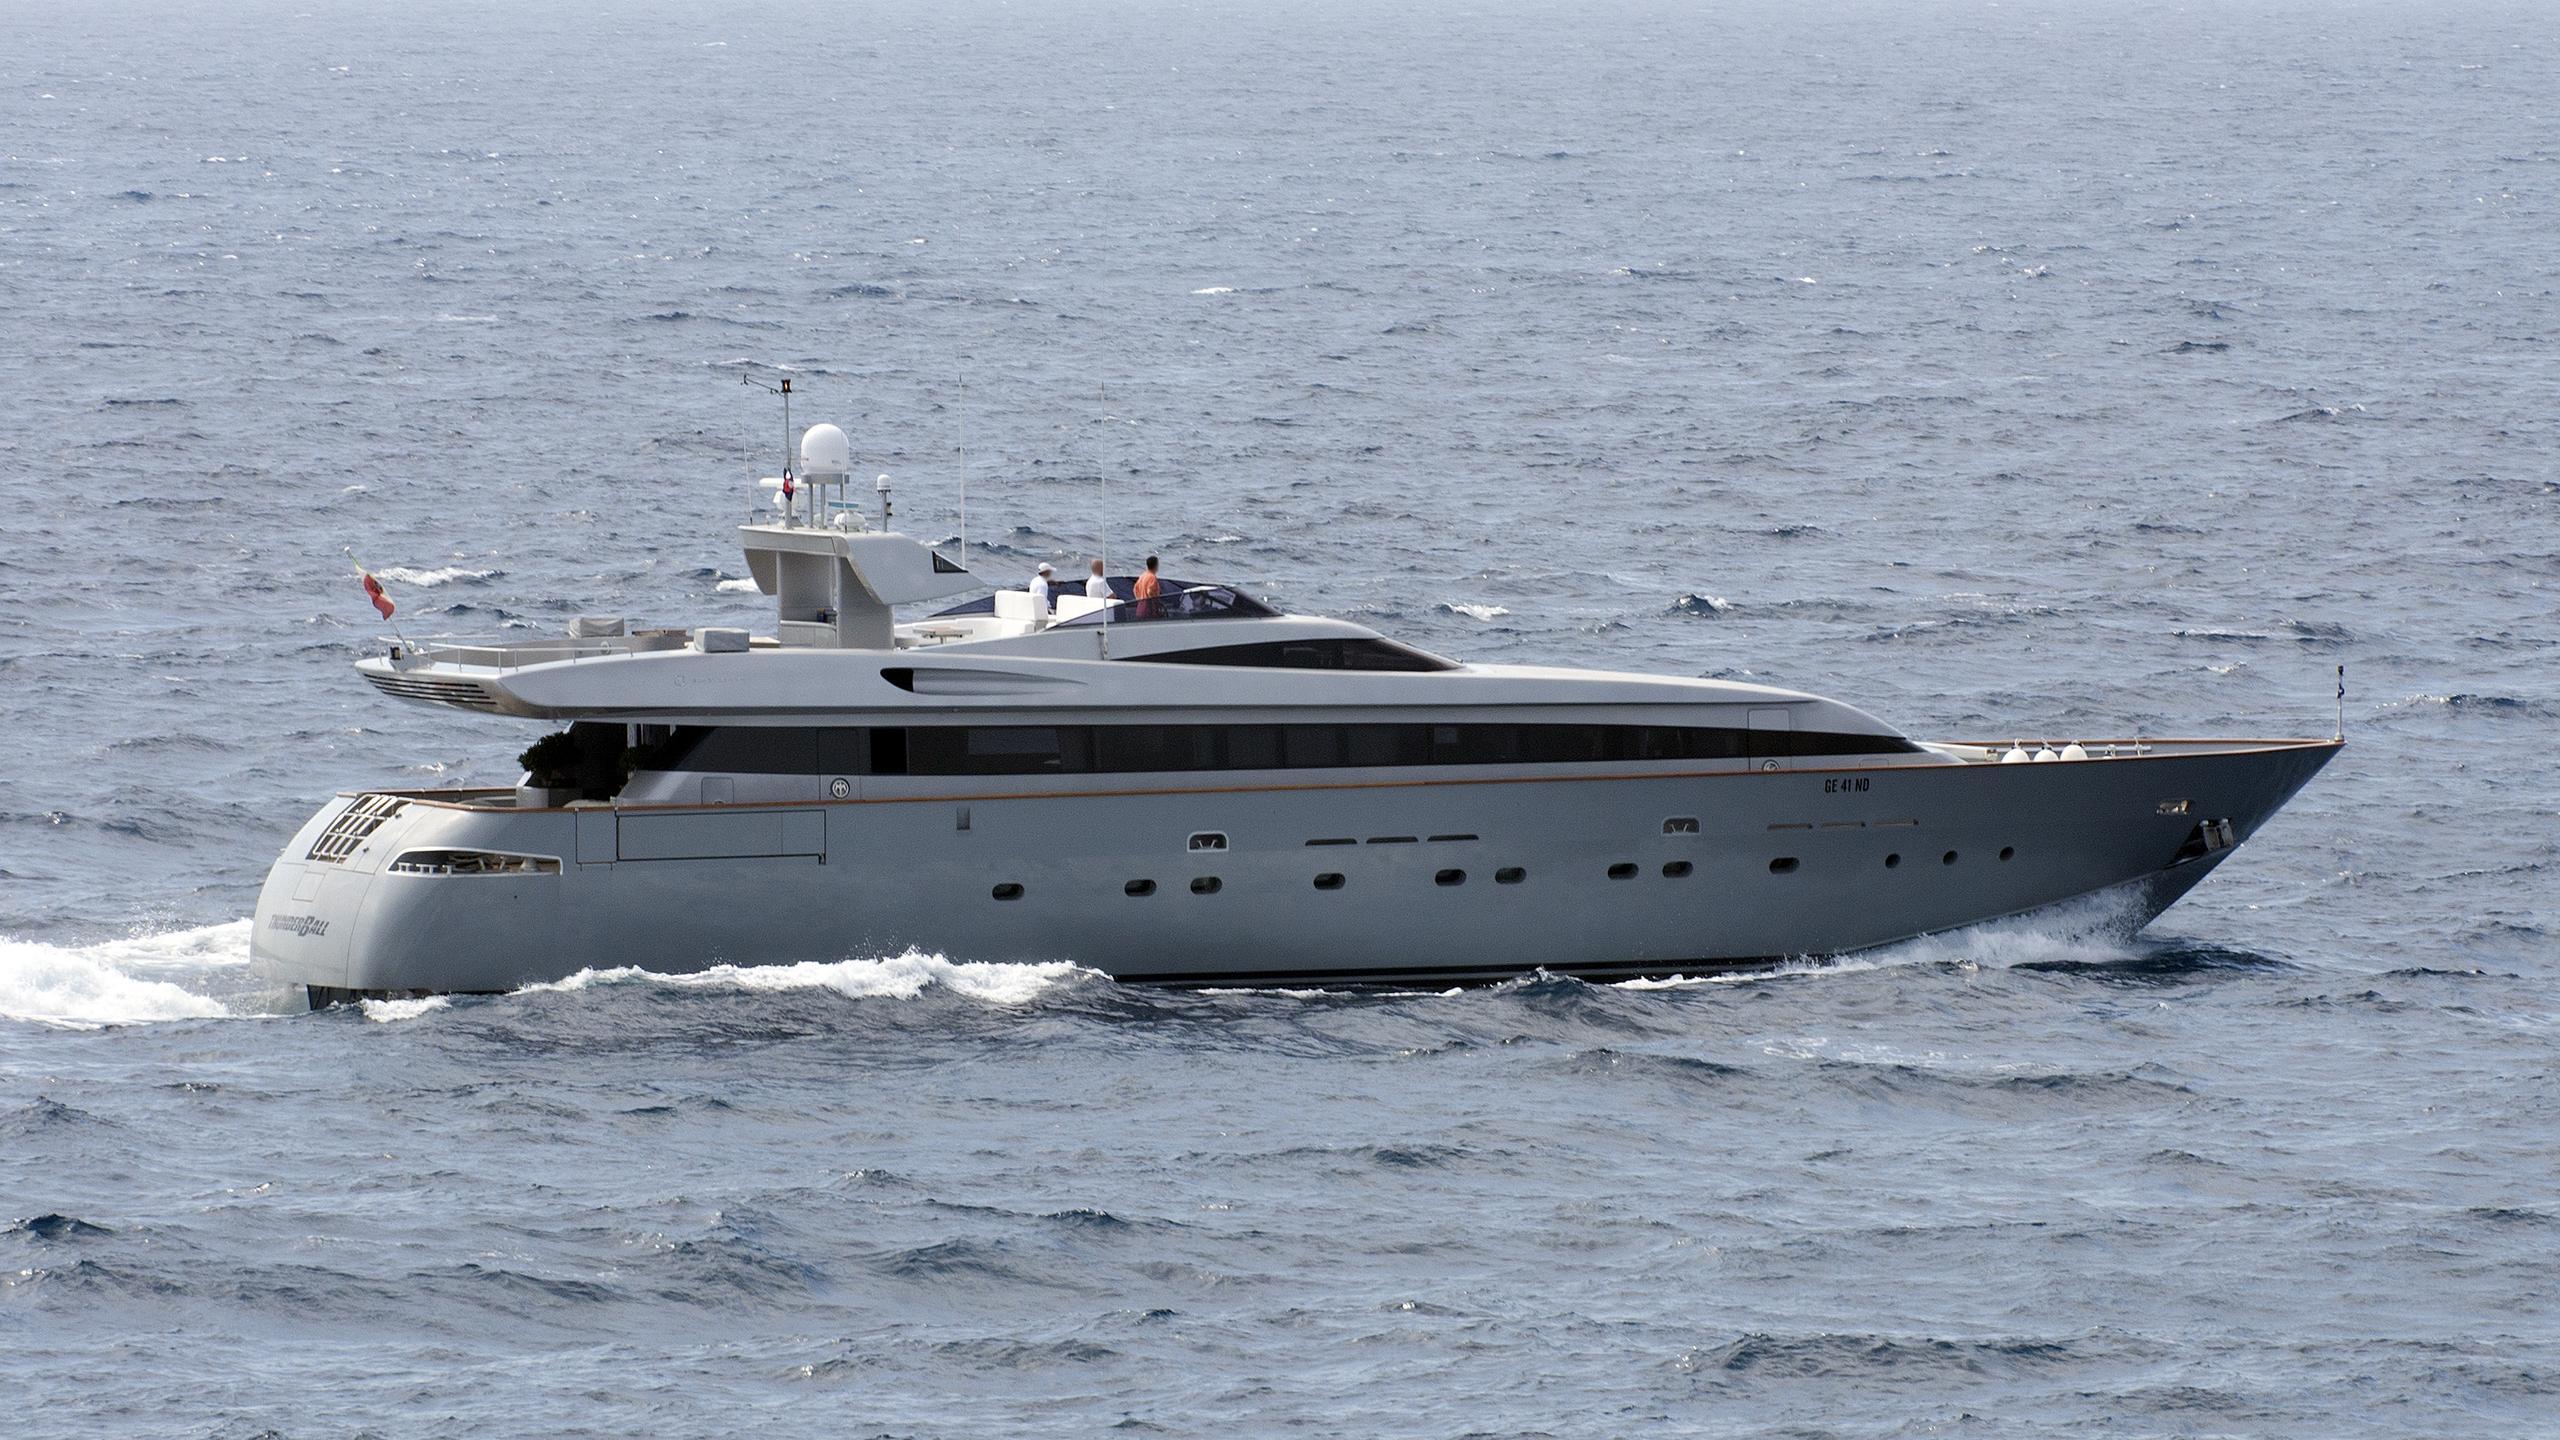 thunderball-motor-yacht-baglietto-2001§-34m-cruising